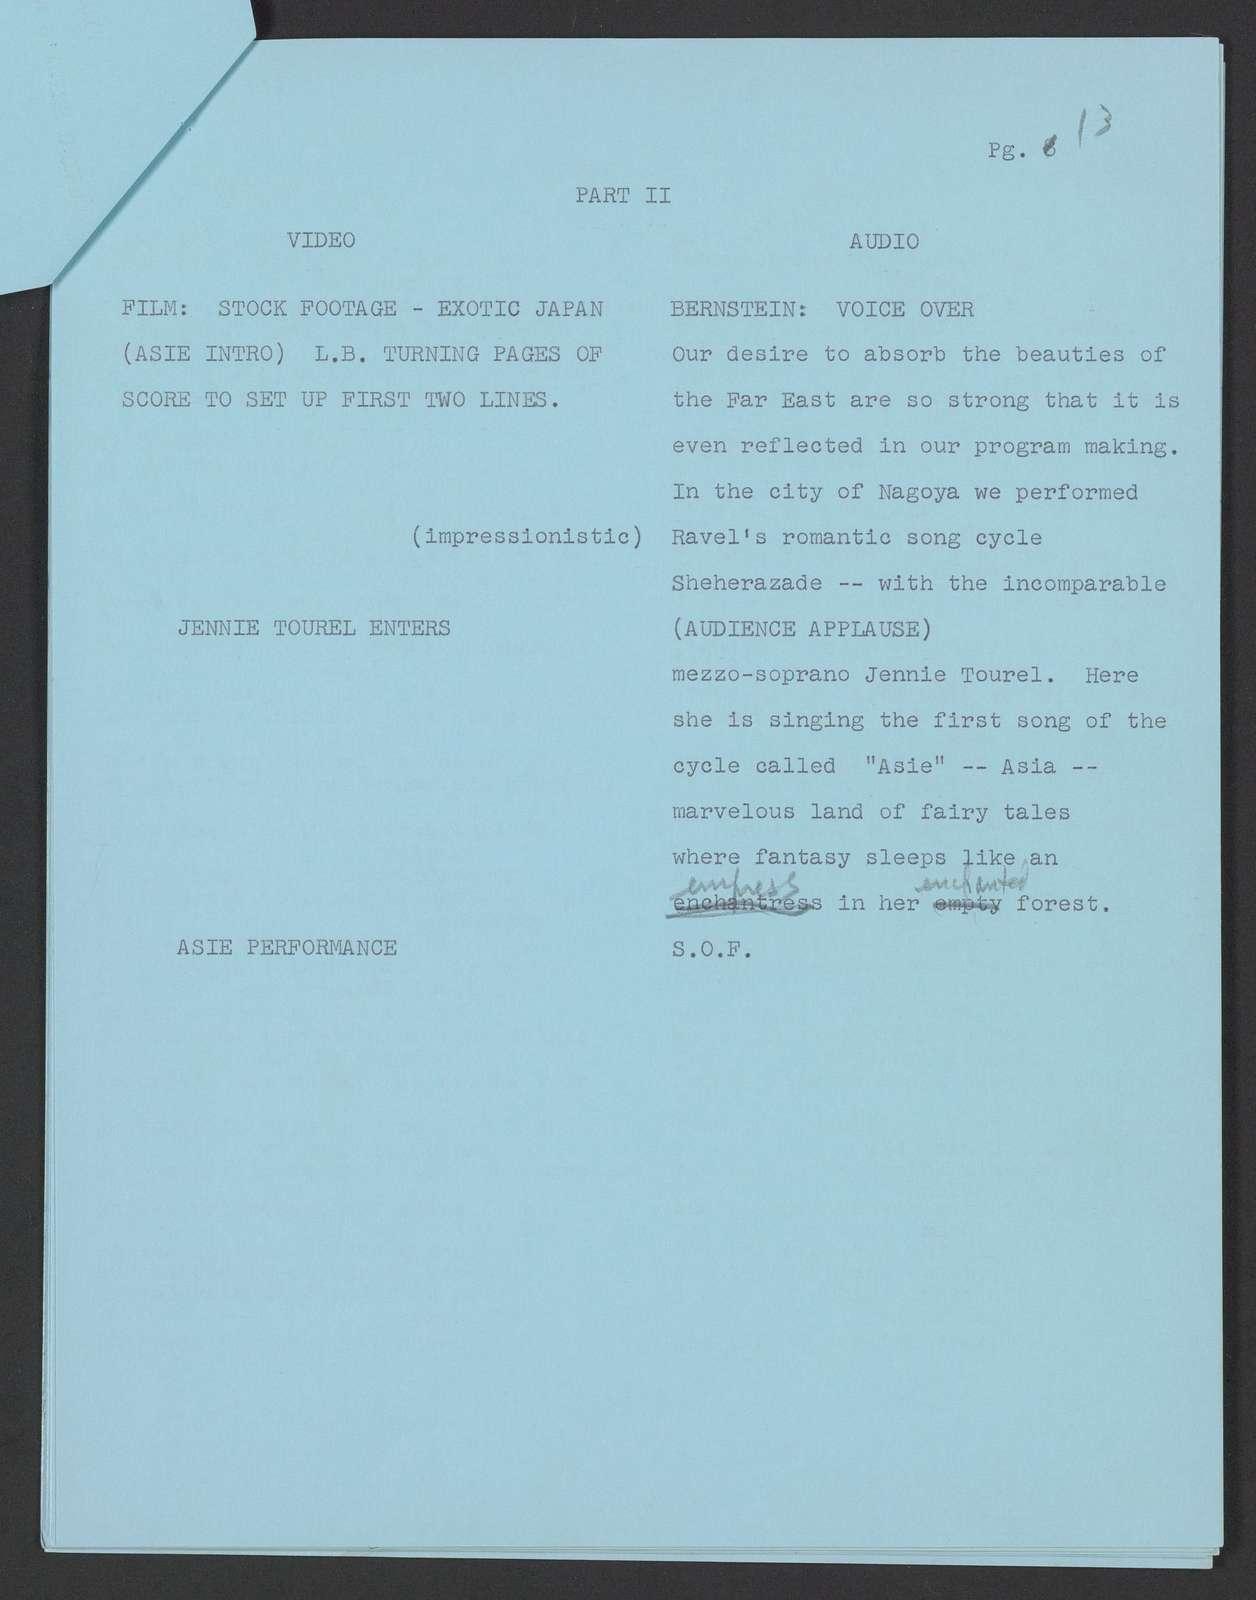 Leonard Bernstein and the New York Philharmonic in Japan TV script, Ford Presents, 1962 Feb. 6